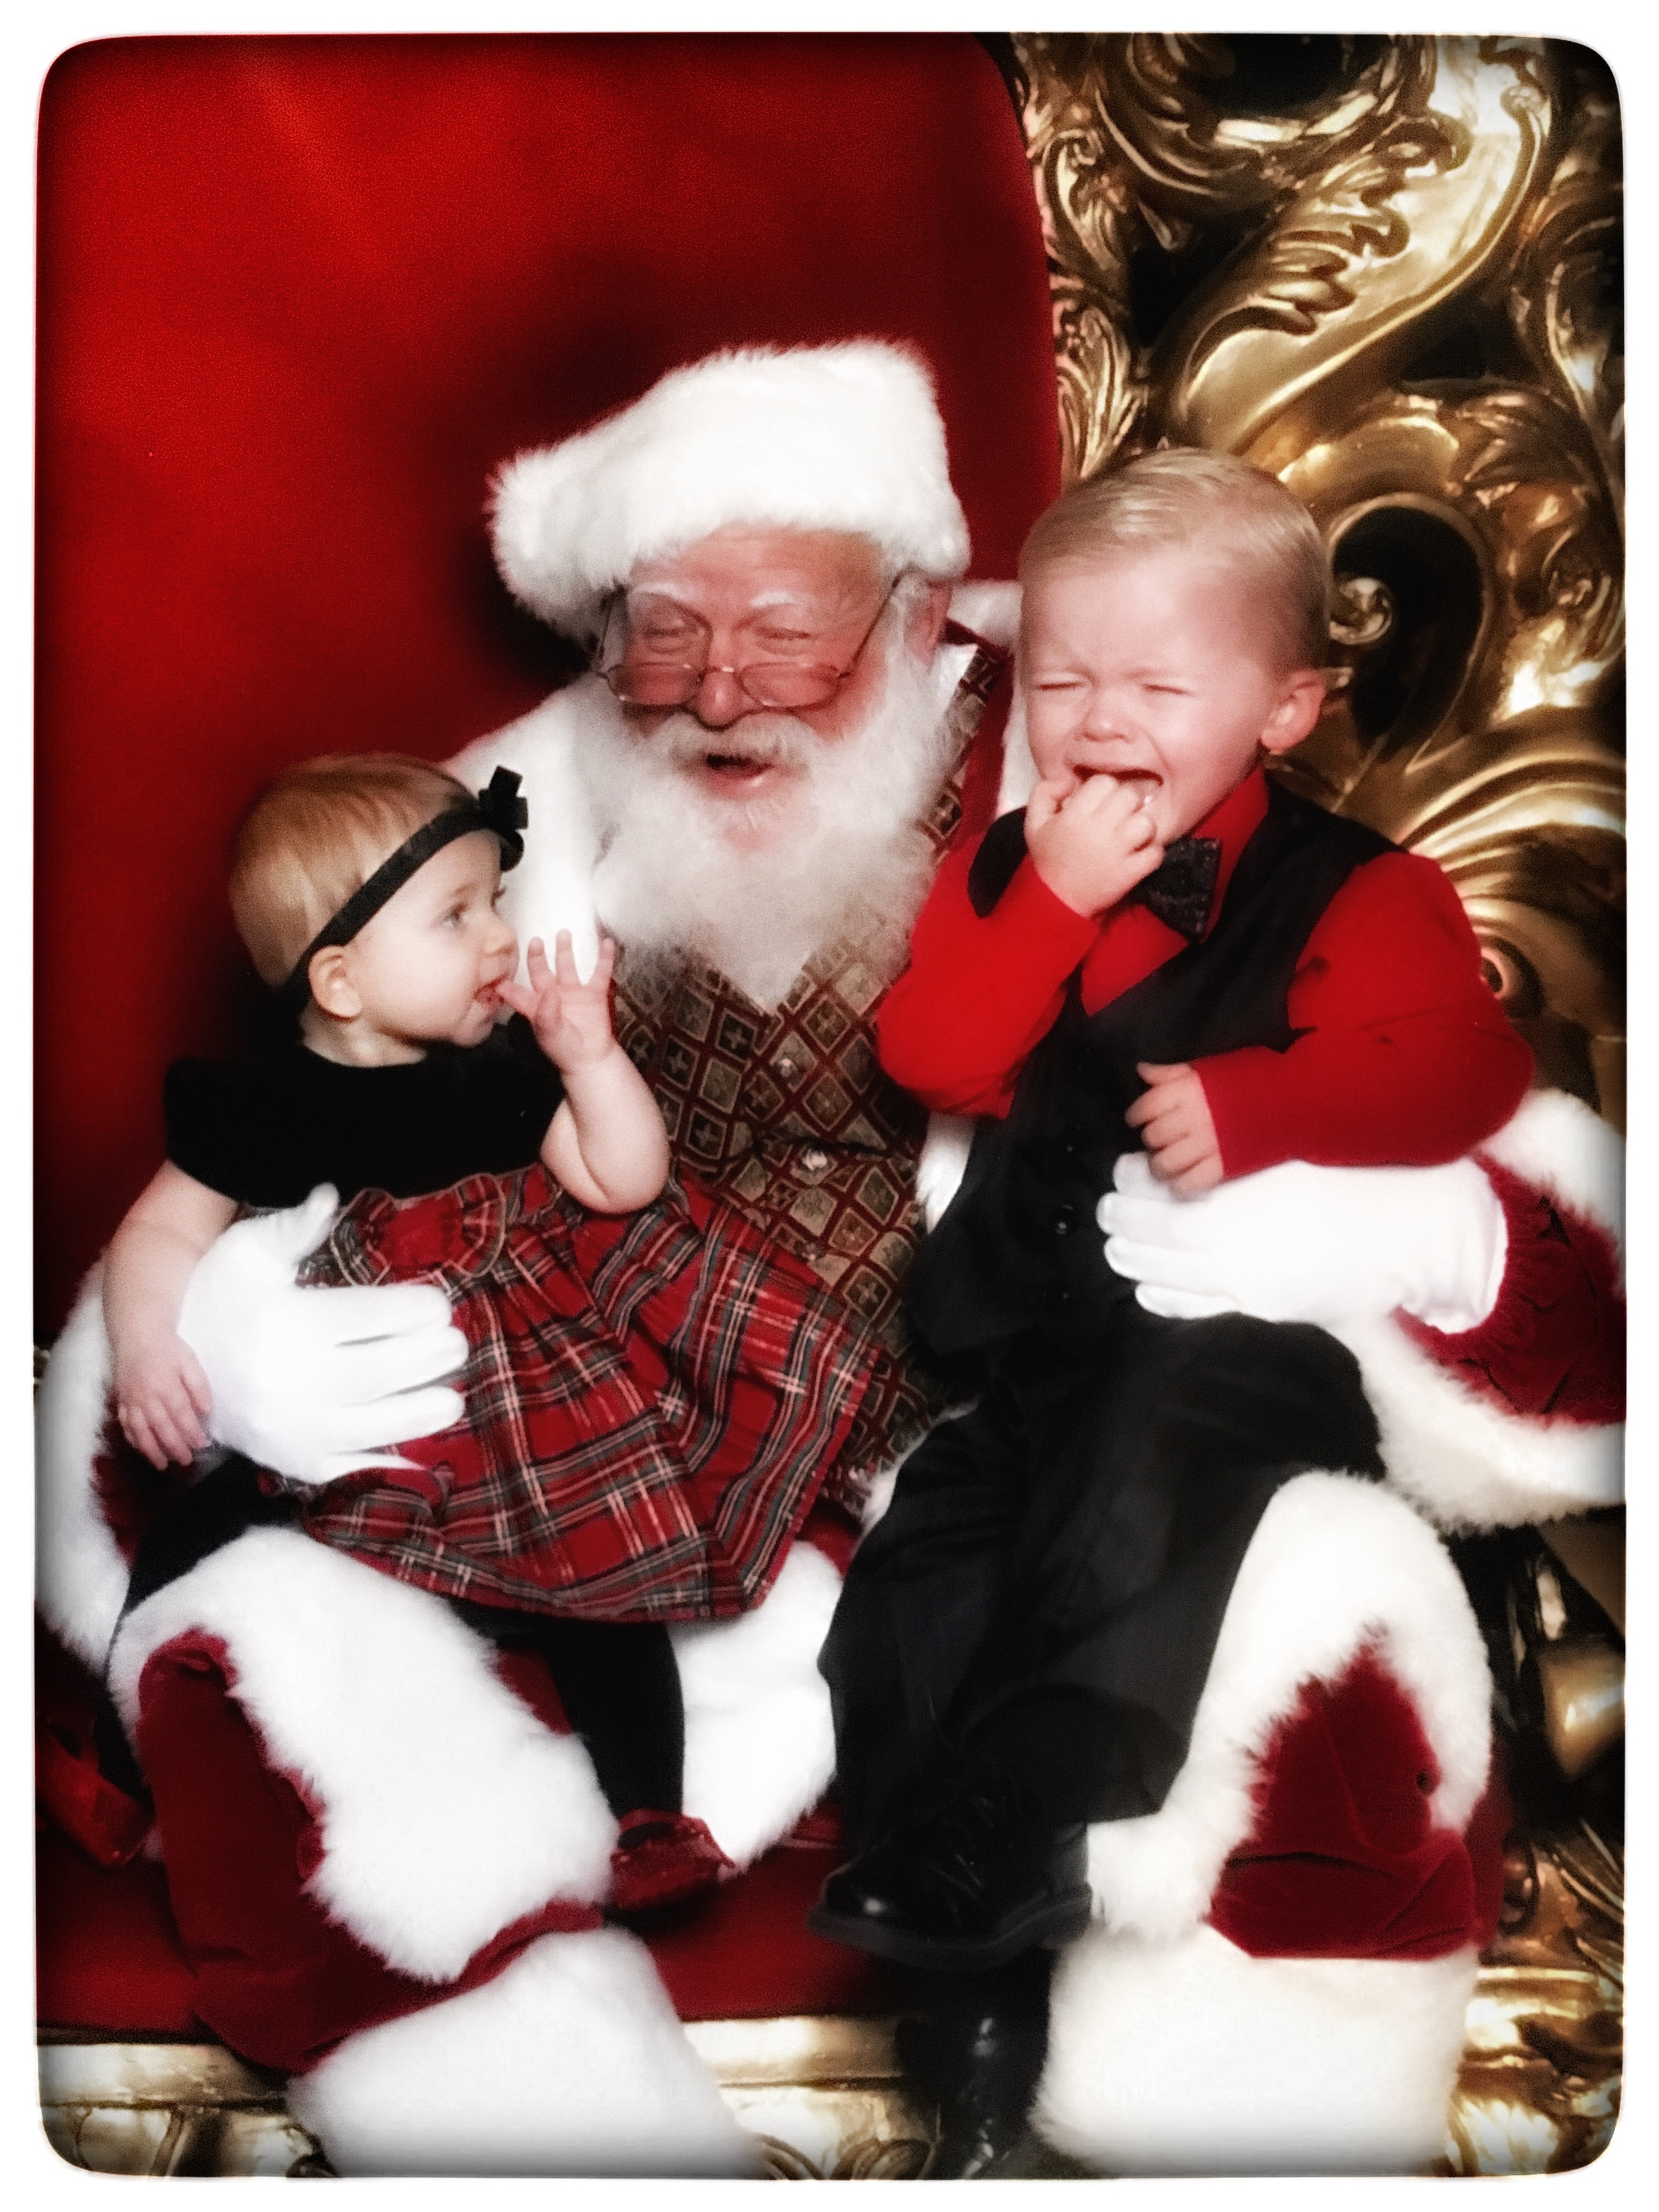 Santa picture at the mall in Sierra Vista, AZ